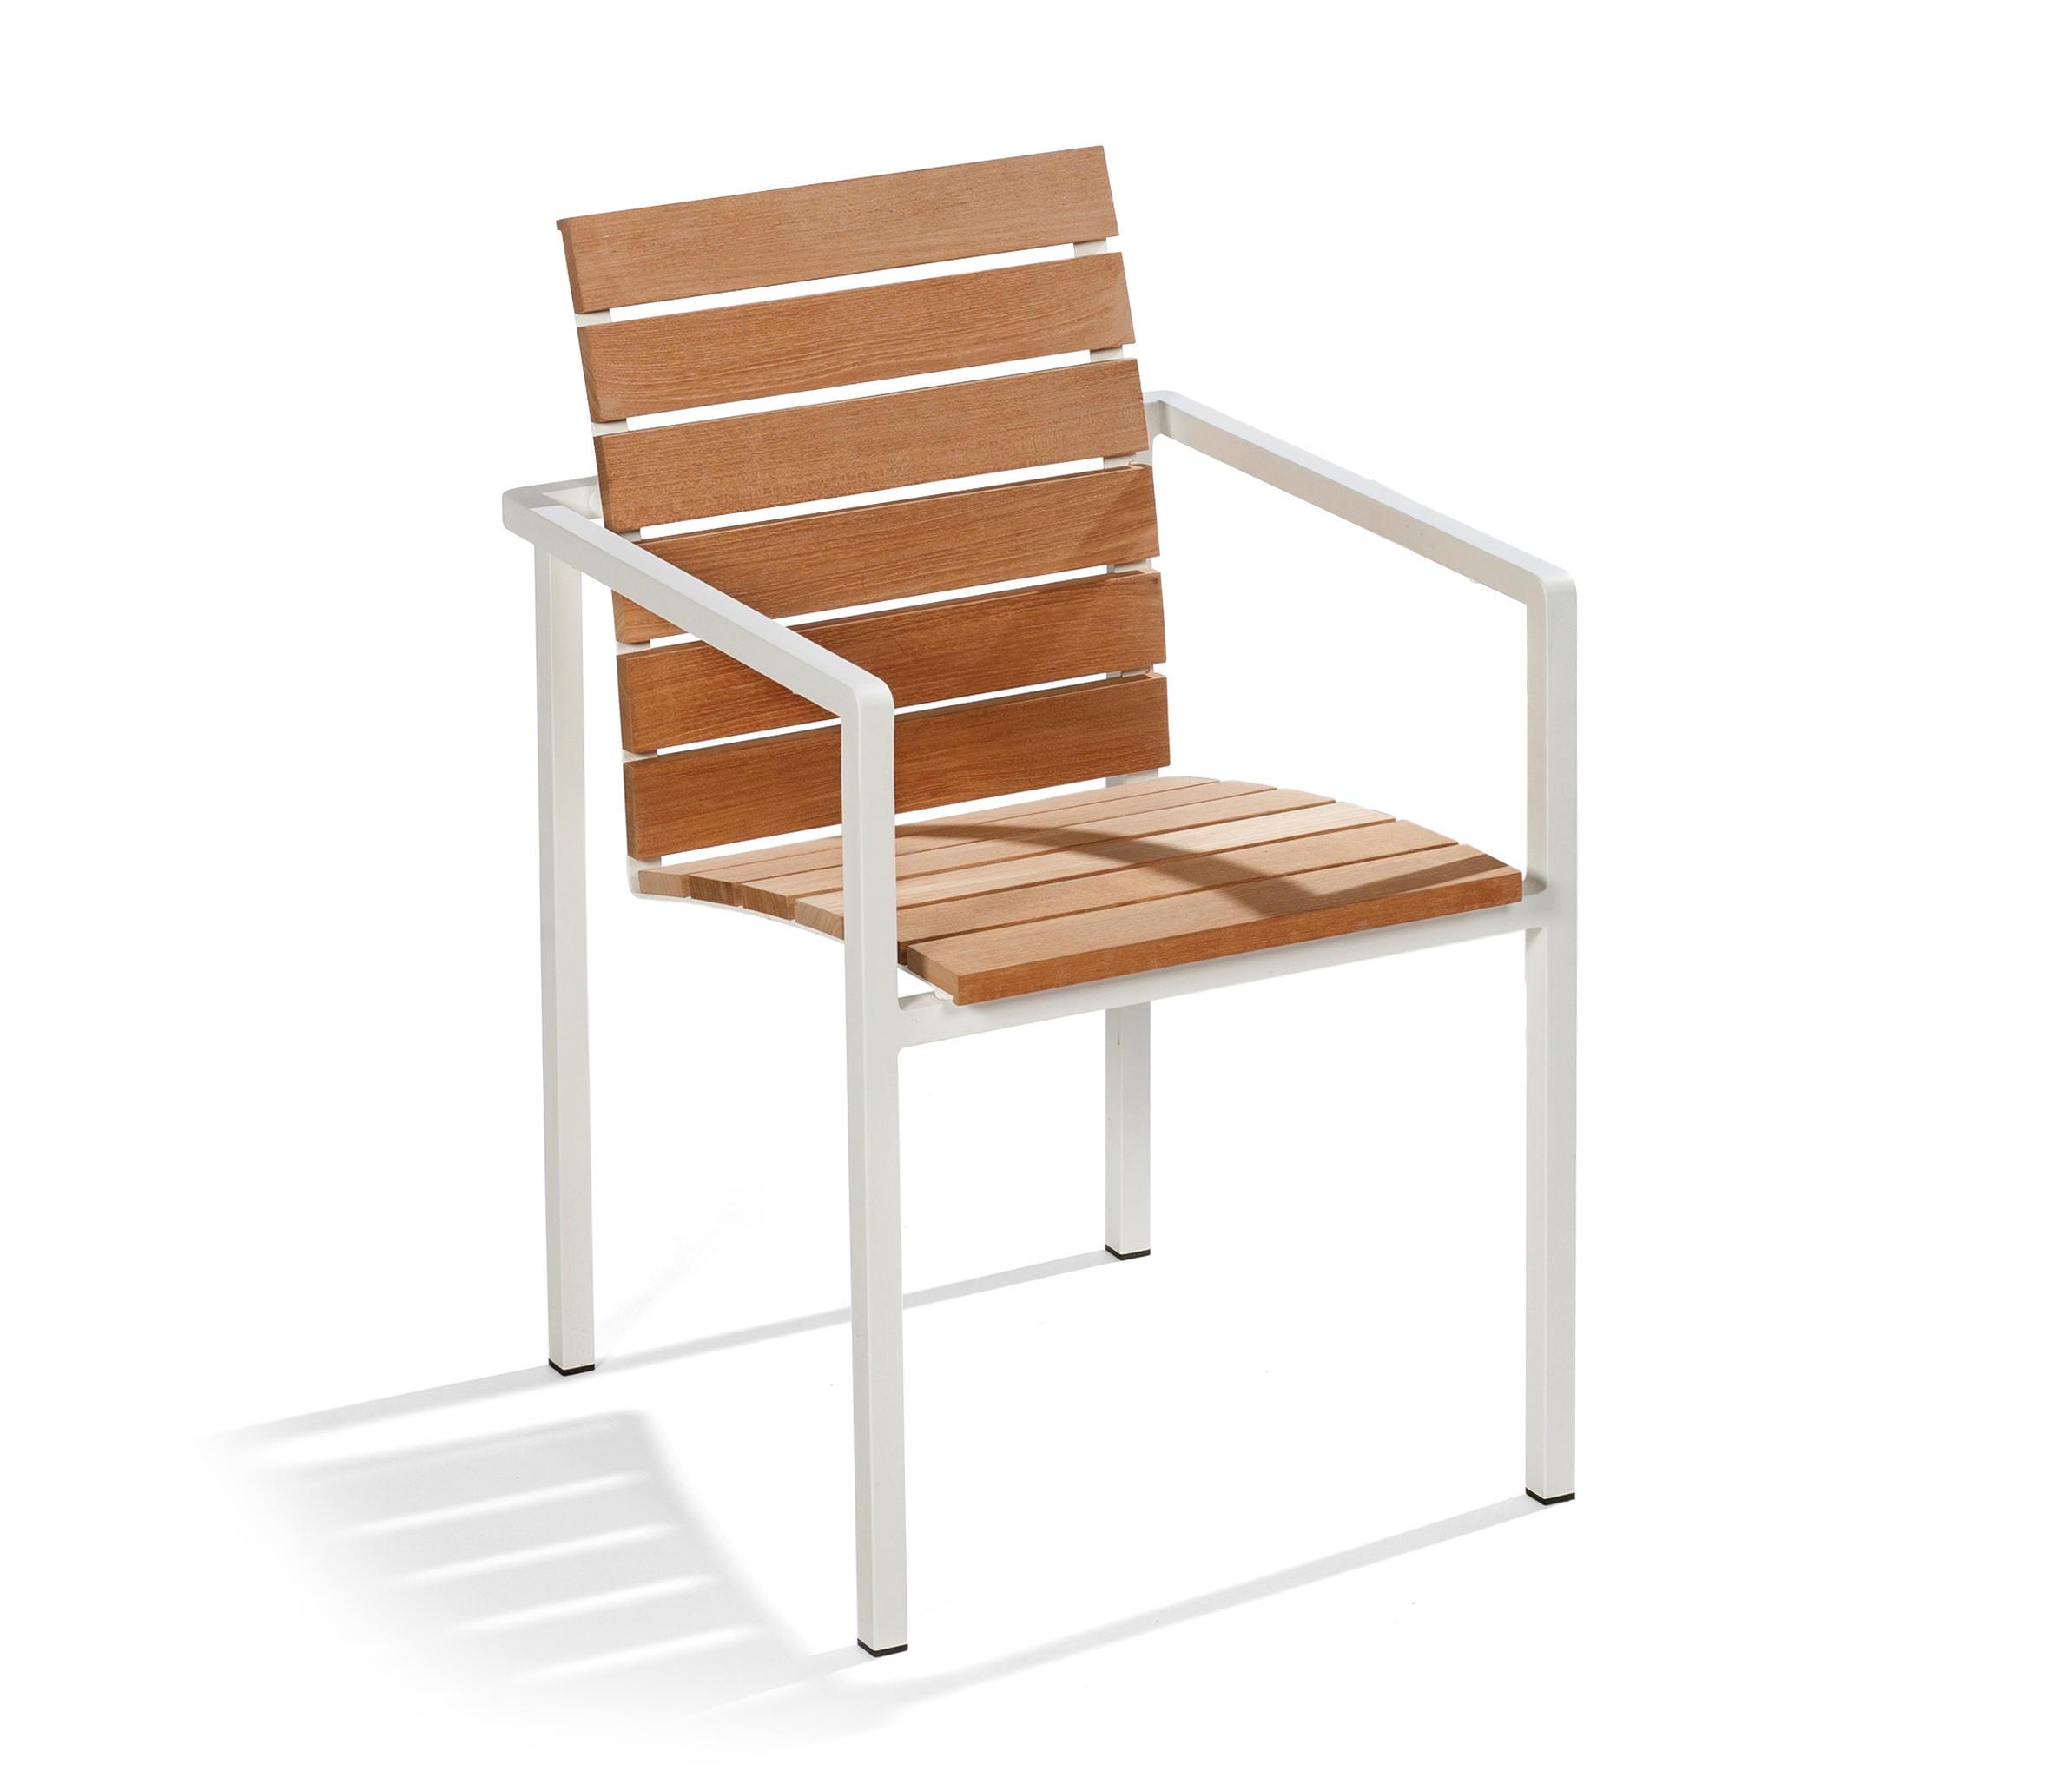 NATAL ALU TEAK ARMCHAIR - Garden chairs from Tribù | Architonic